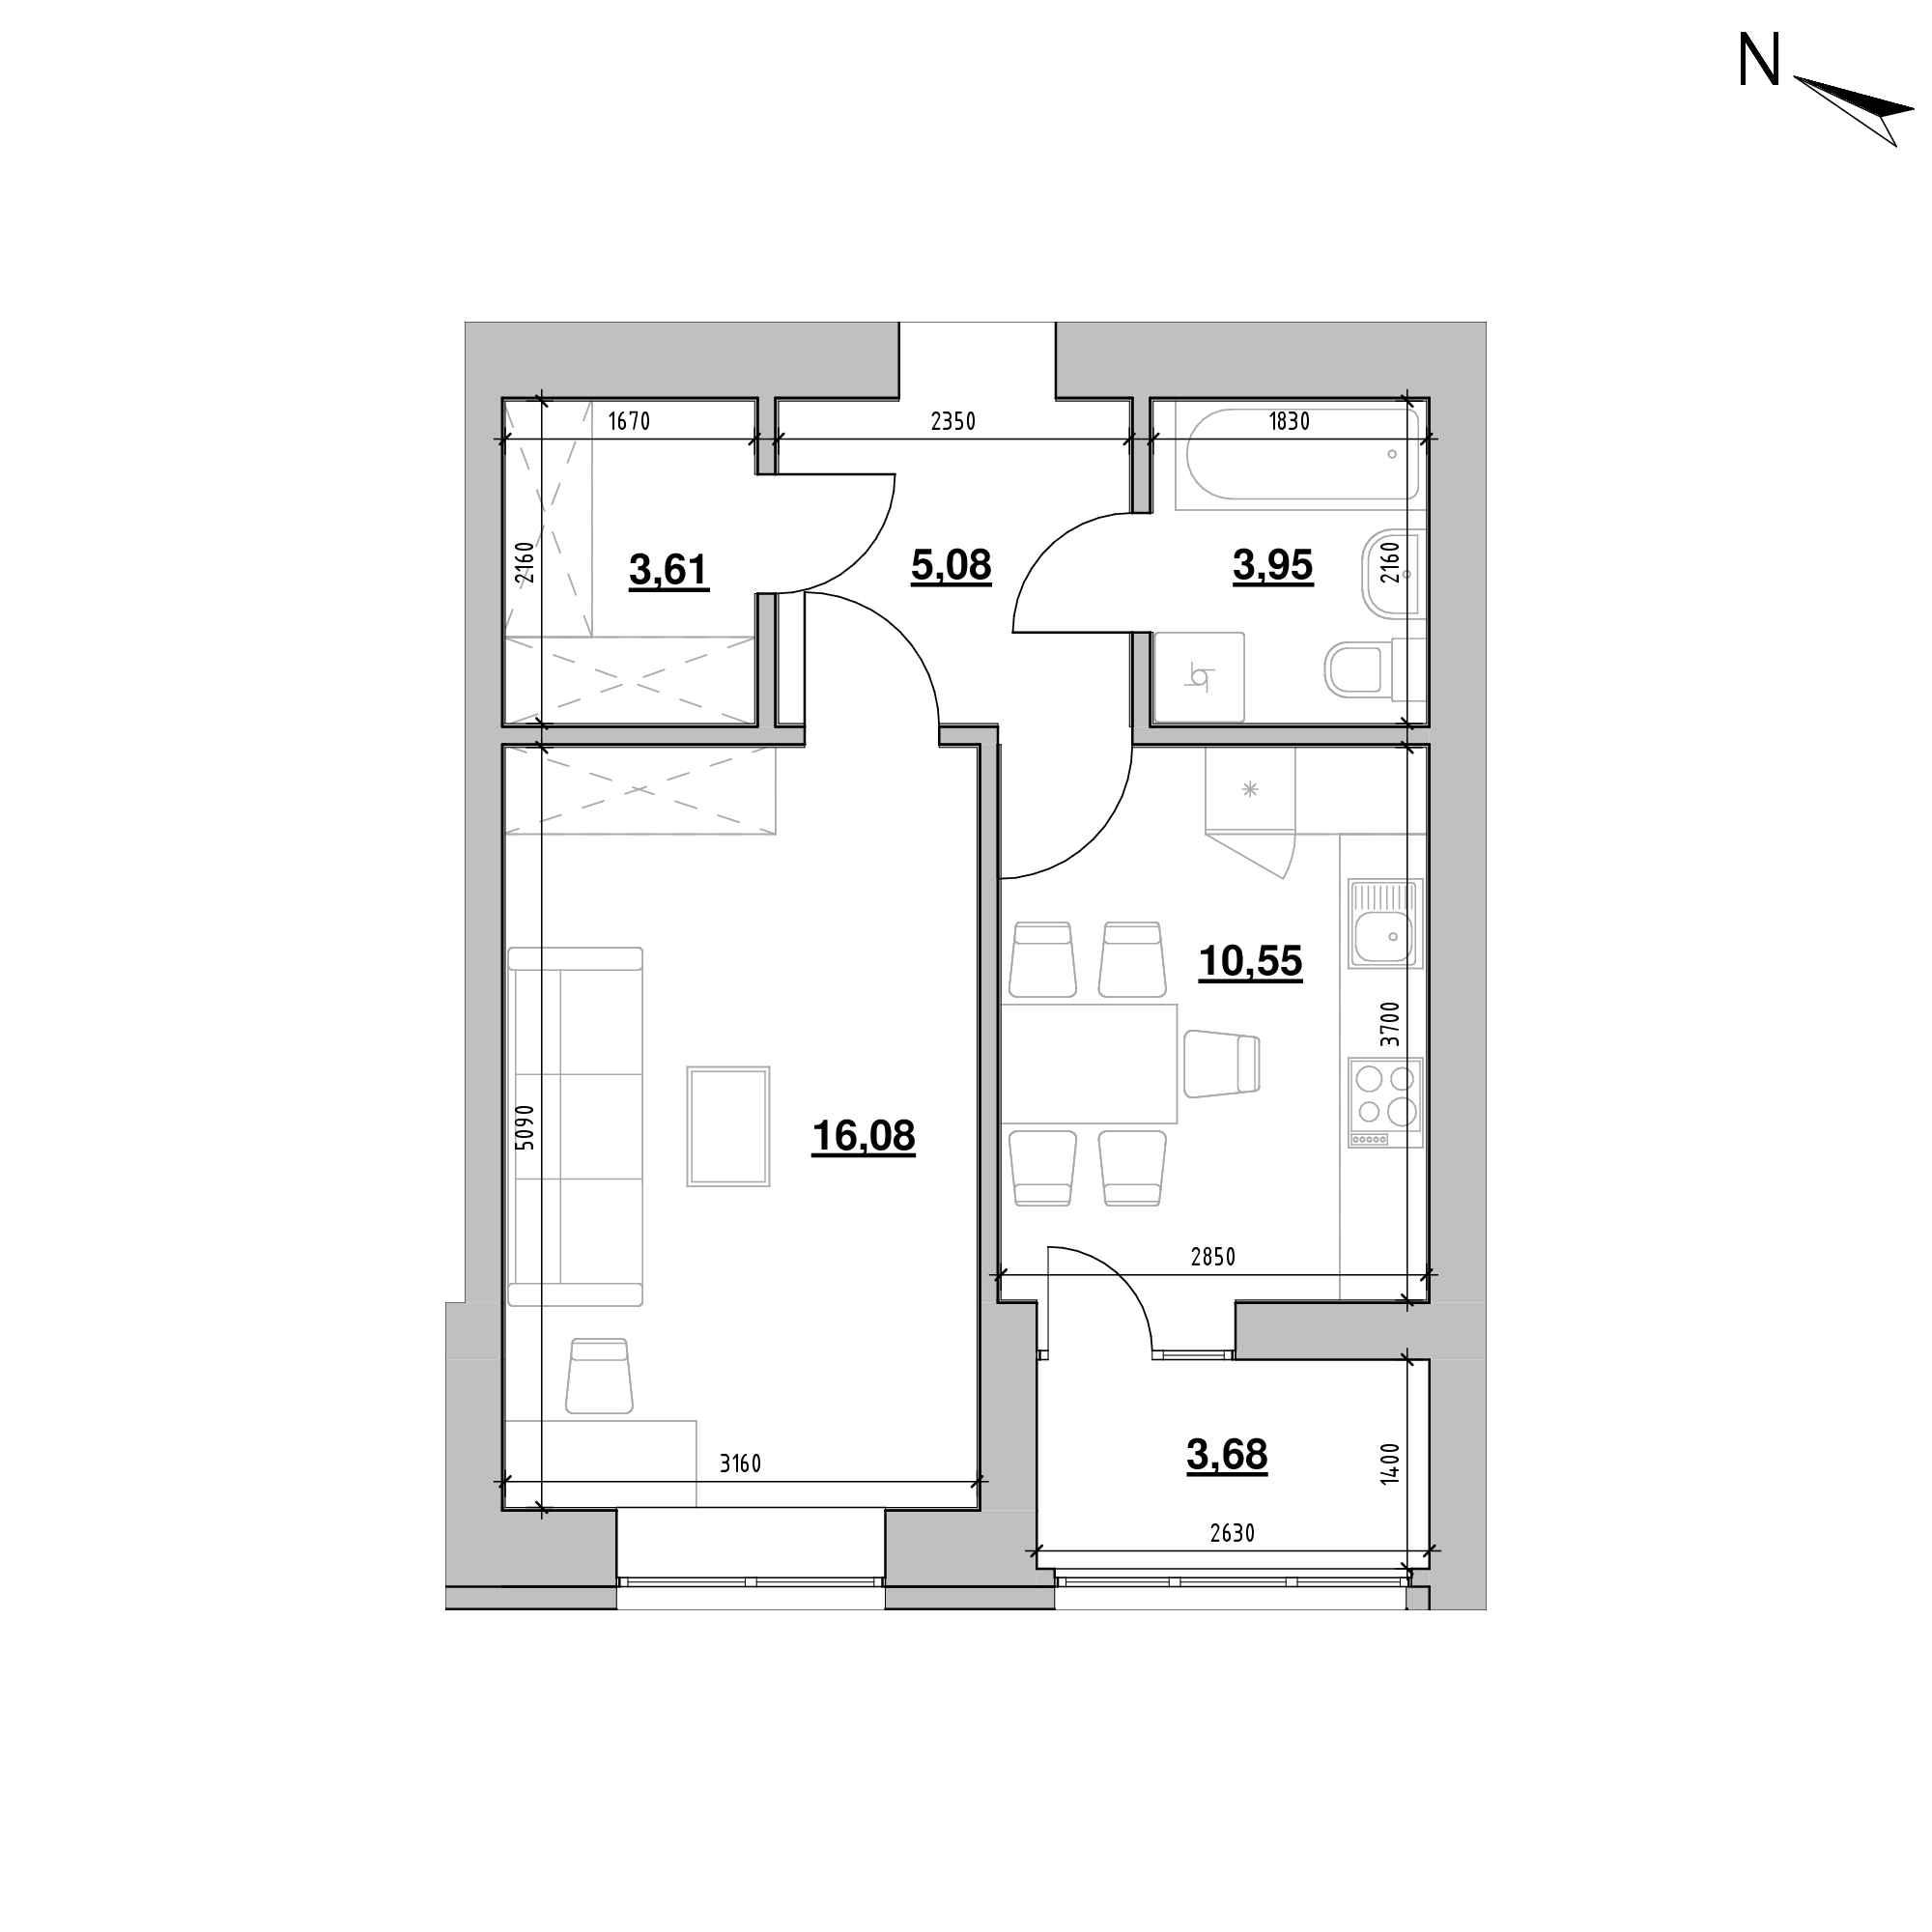 ЖК Шенген: планування 1-кімнатної квартири, №34, 42.95 м<sup>2</sup>